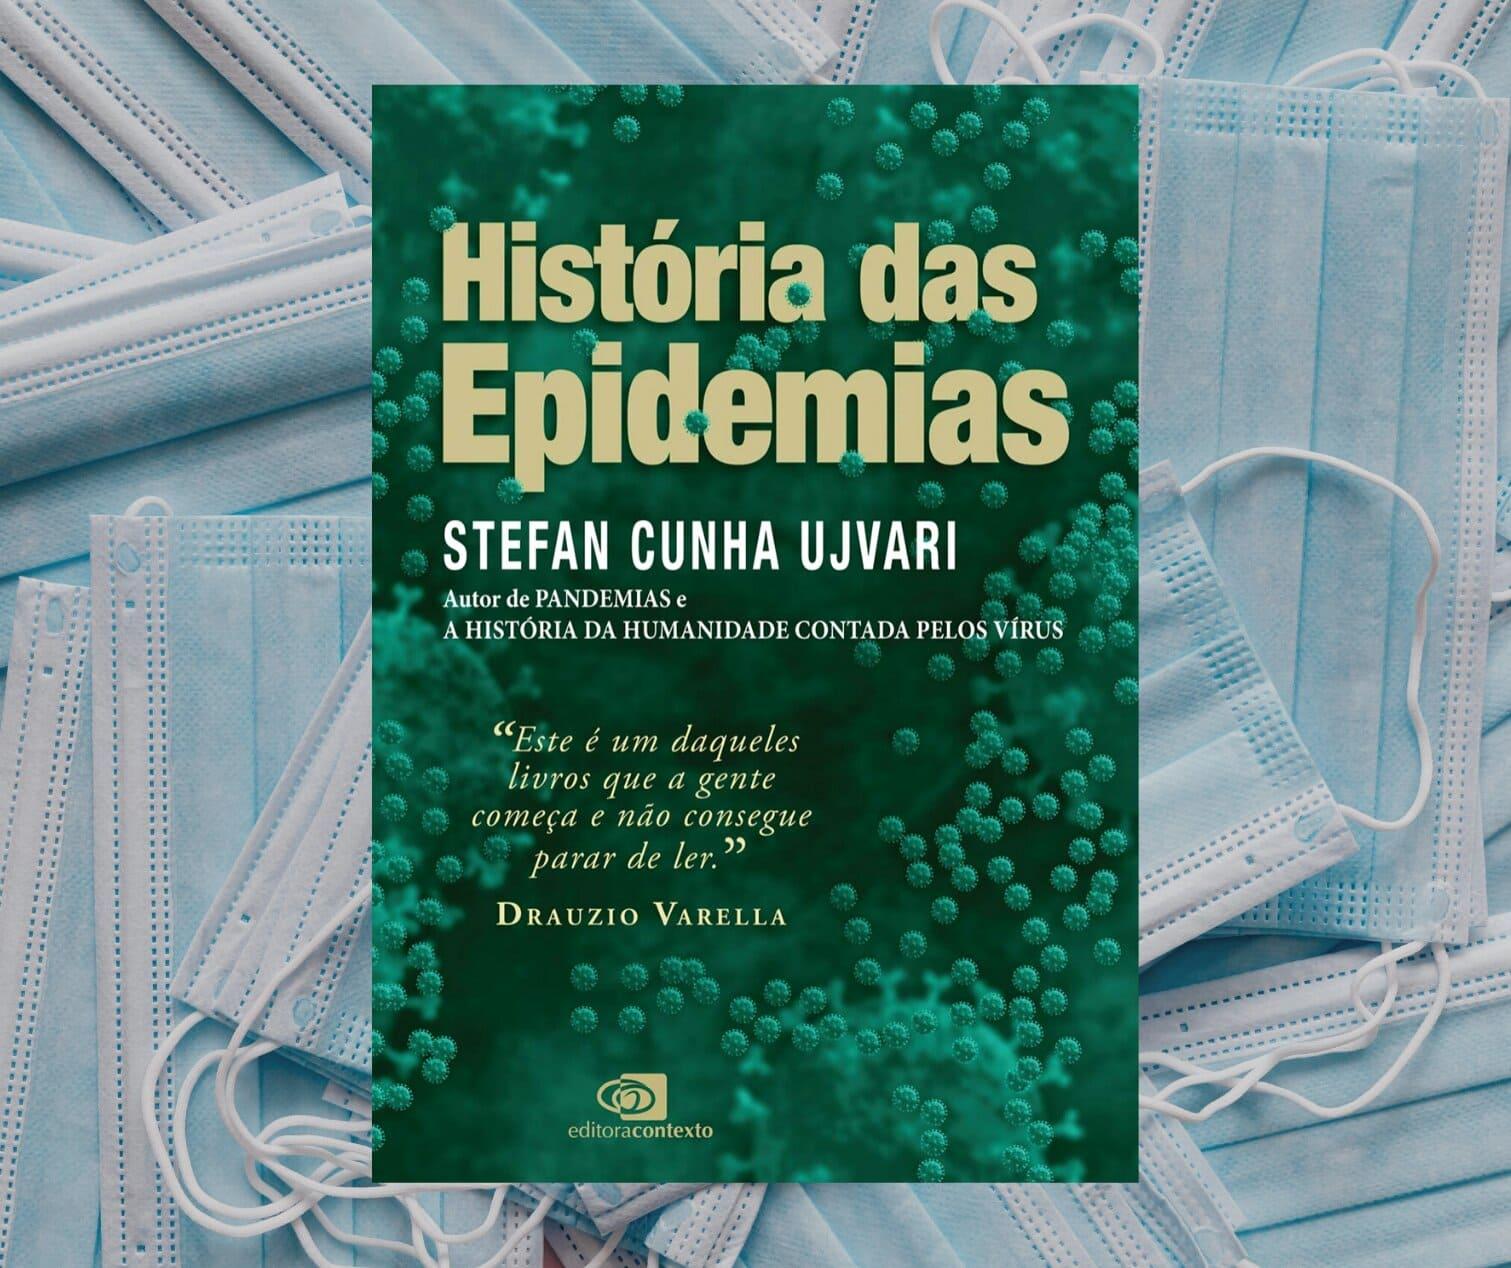 Resenha: História das Epidemias, de Stefan Cunha Ujvari